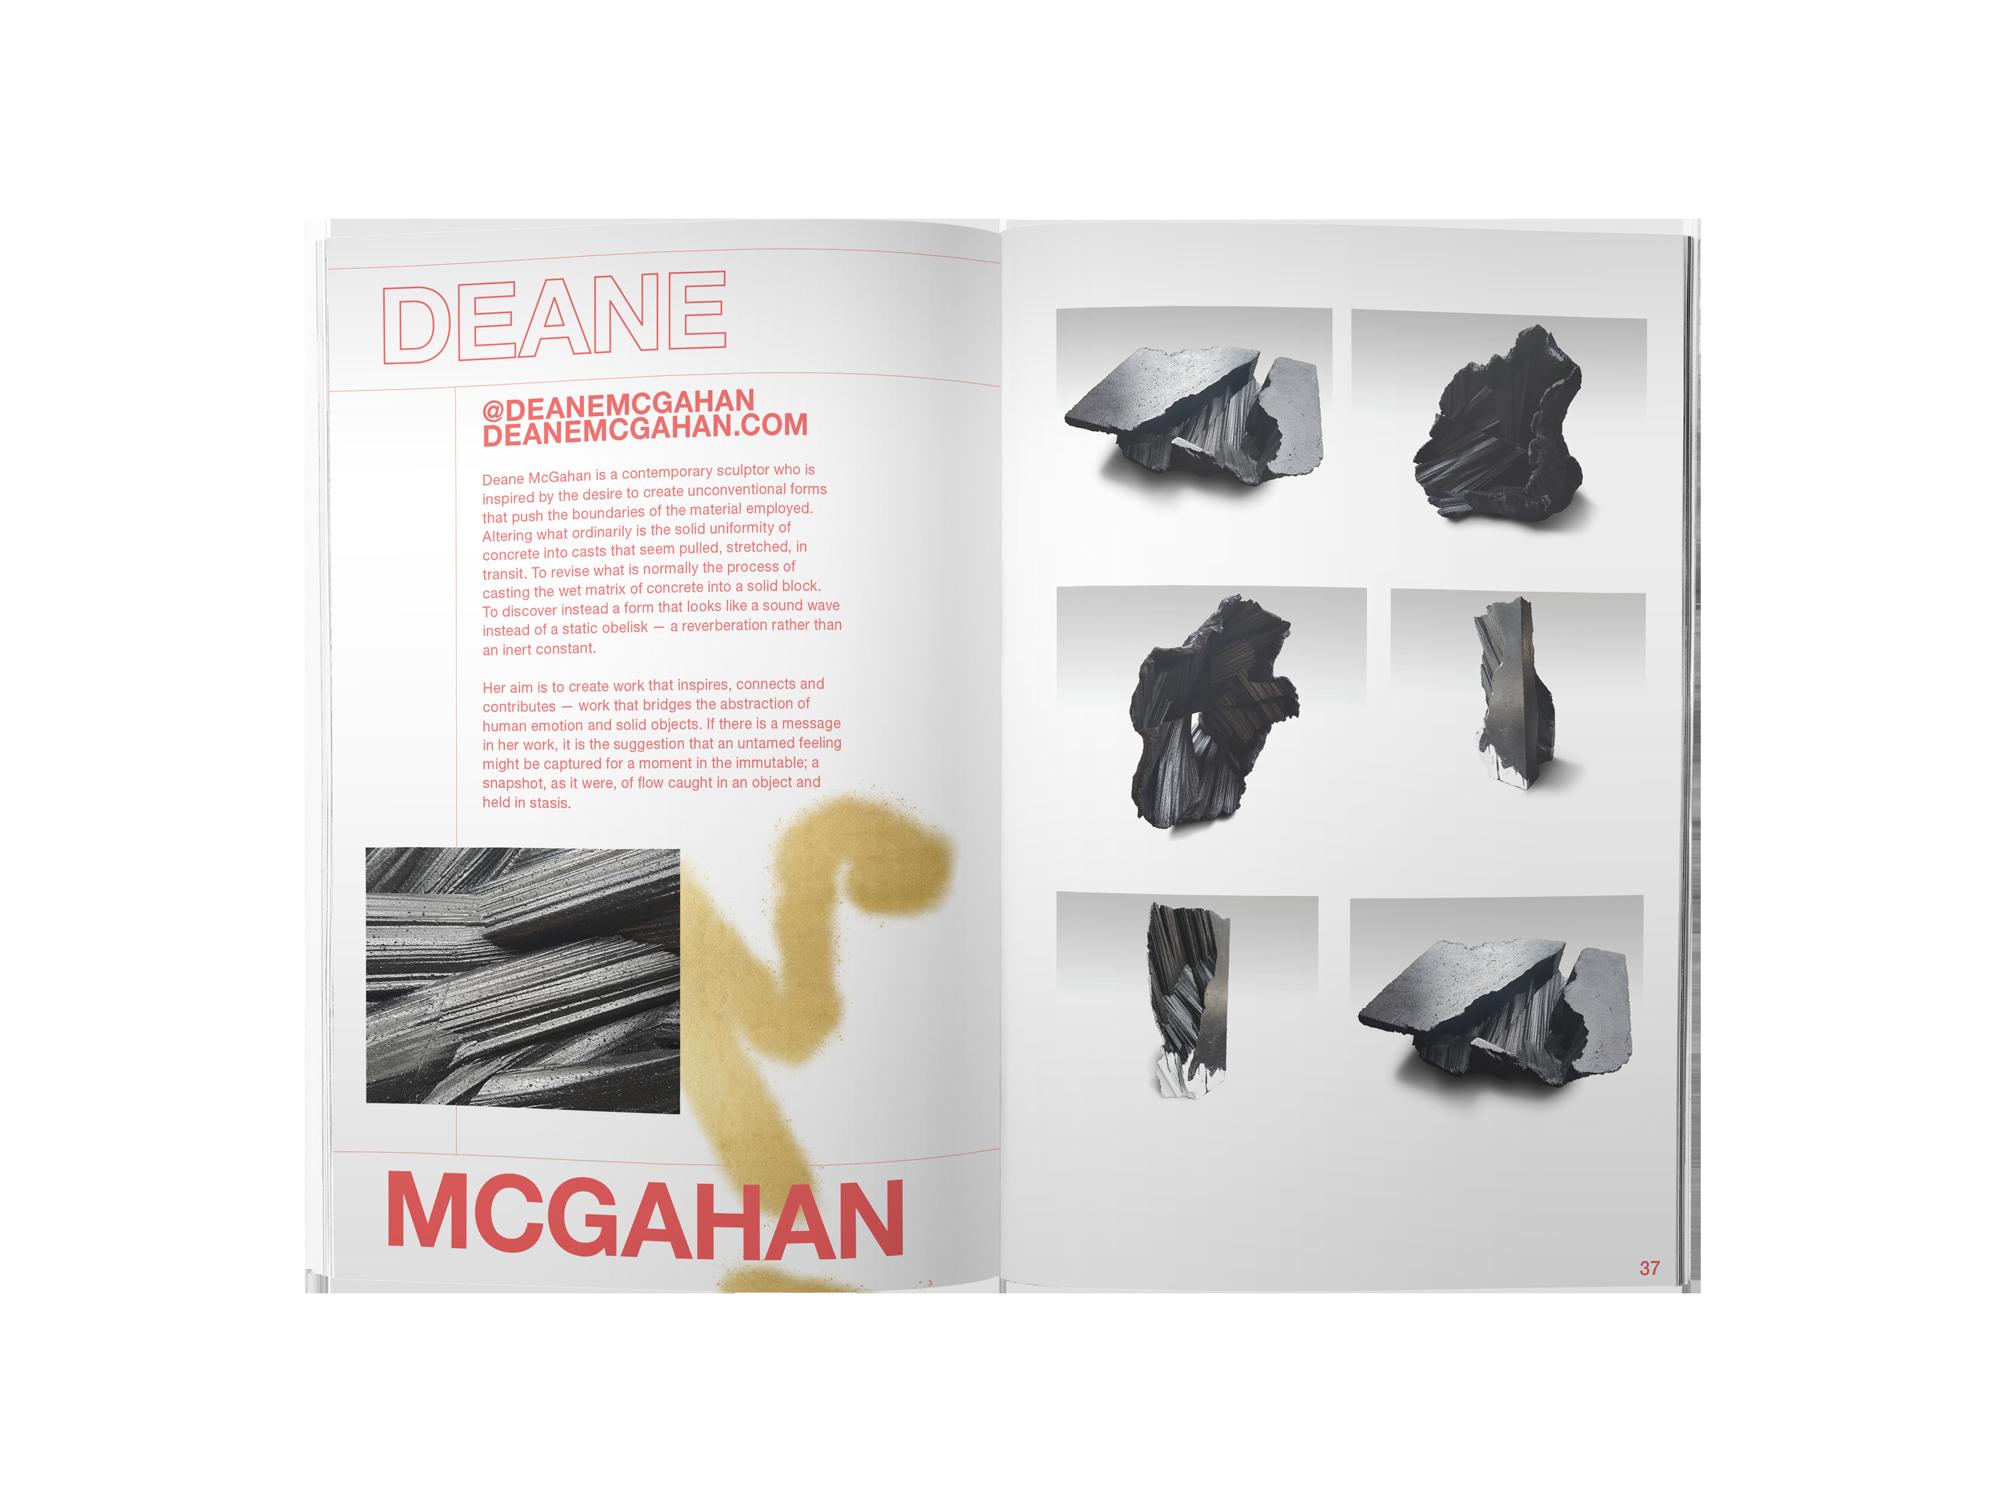 deane-mcgahan.png